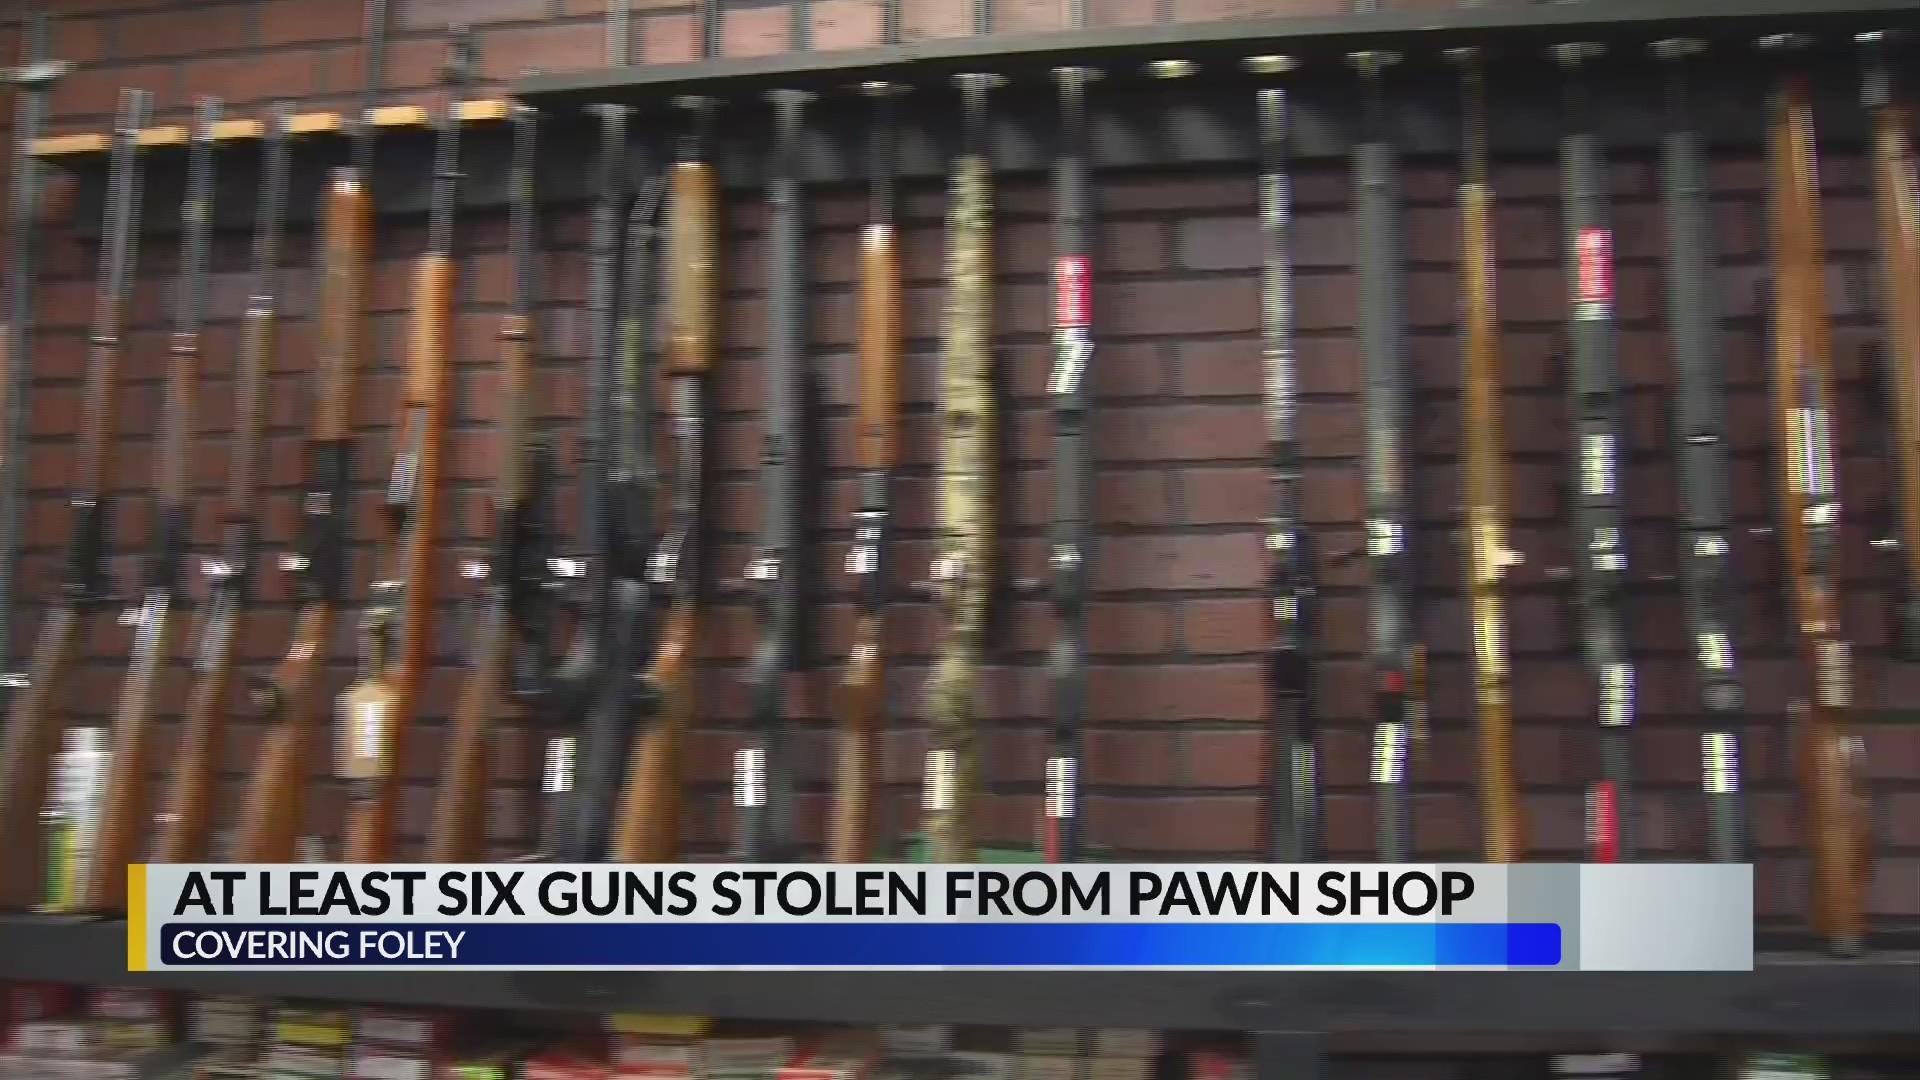 Final stolen gun recovered in Foley pawn shop burglary case